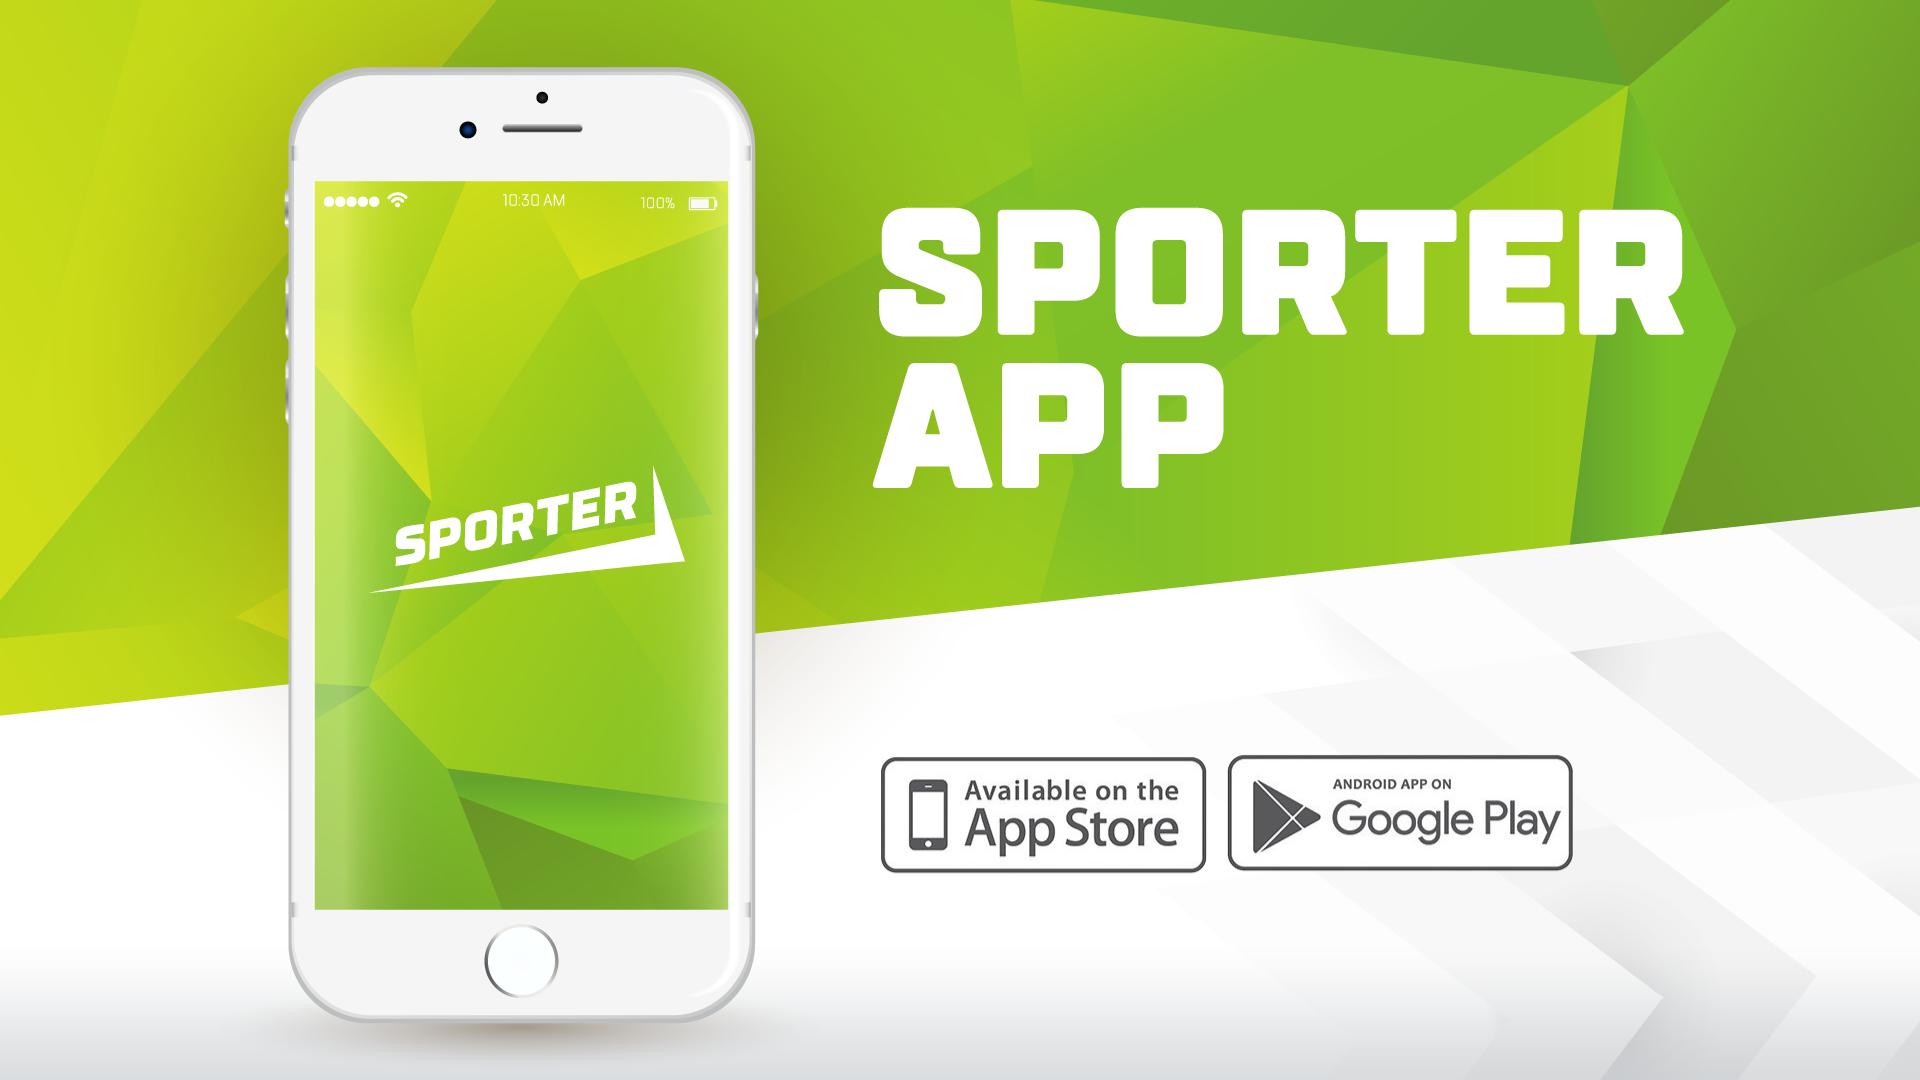 sporter-app-news